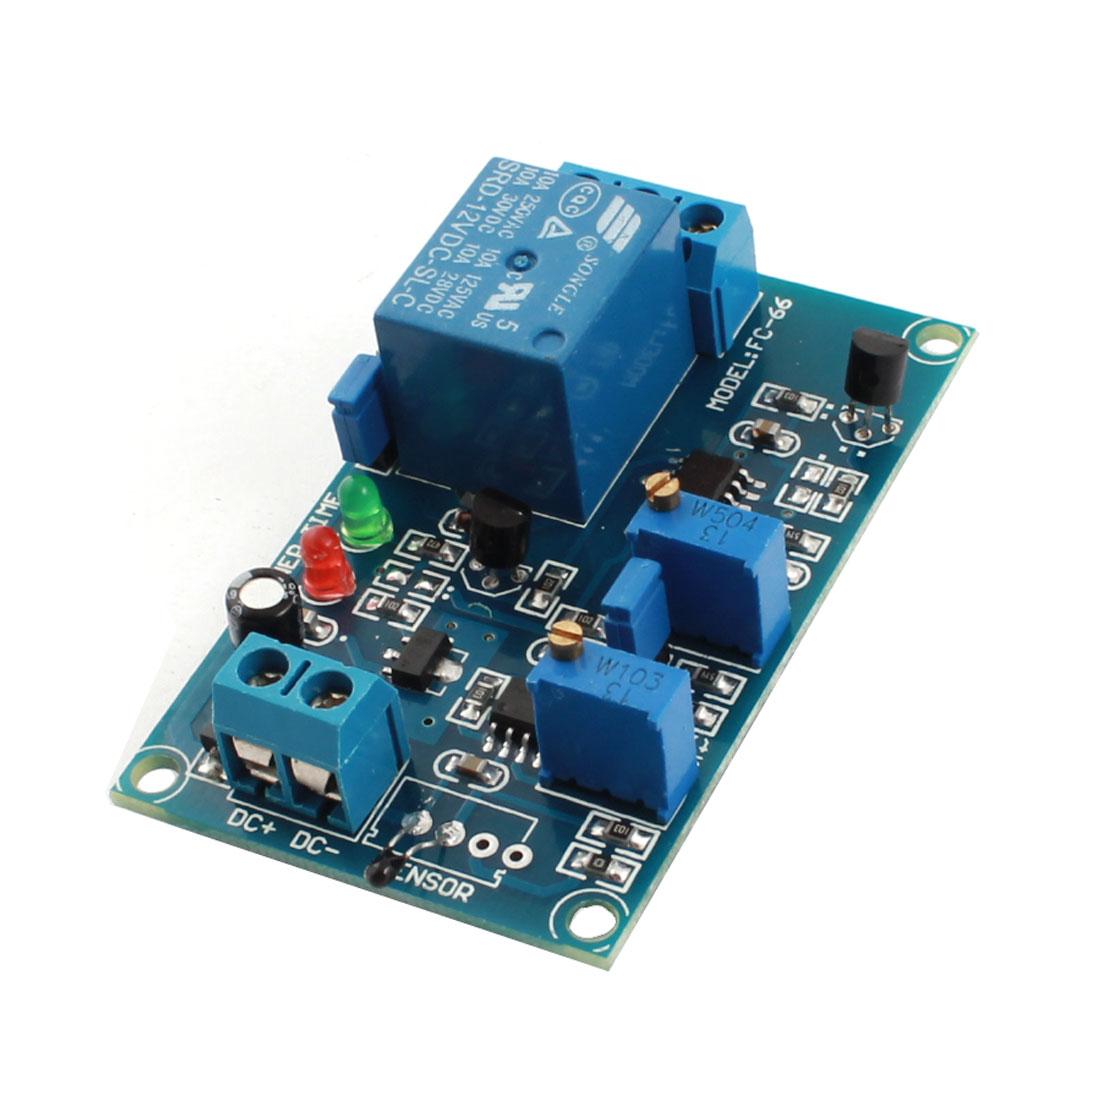 FC-66 DC12V 20S Low Temperature Trigger Thermosensitive Sensor Time Delay Relay Circuit Module Green